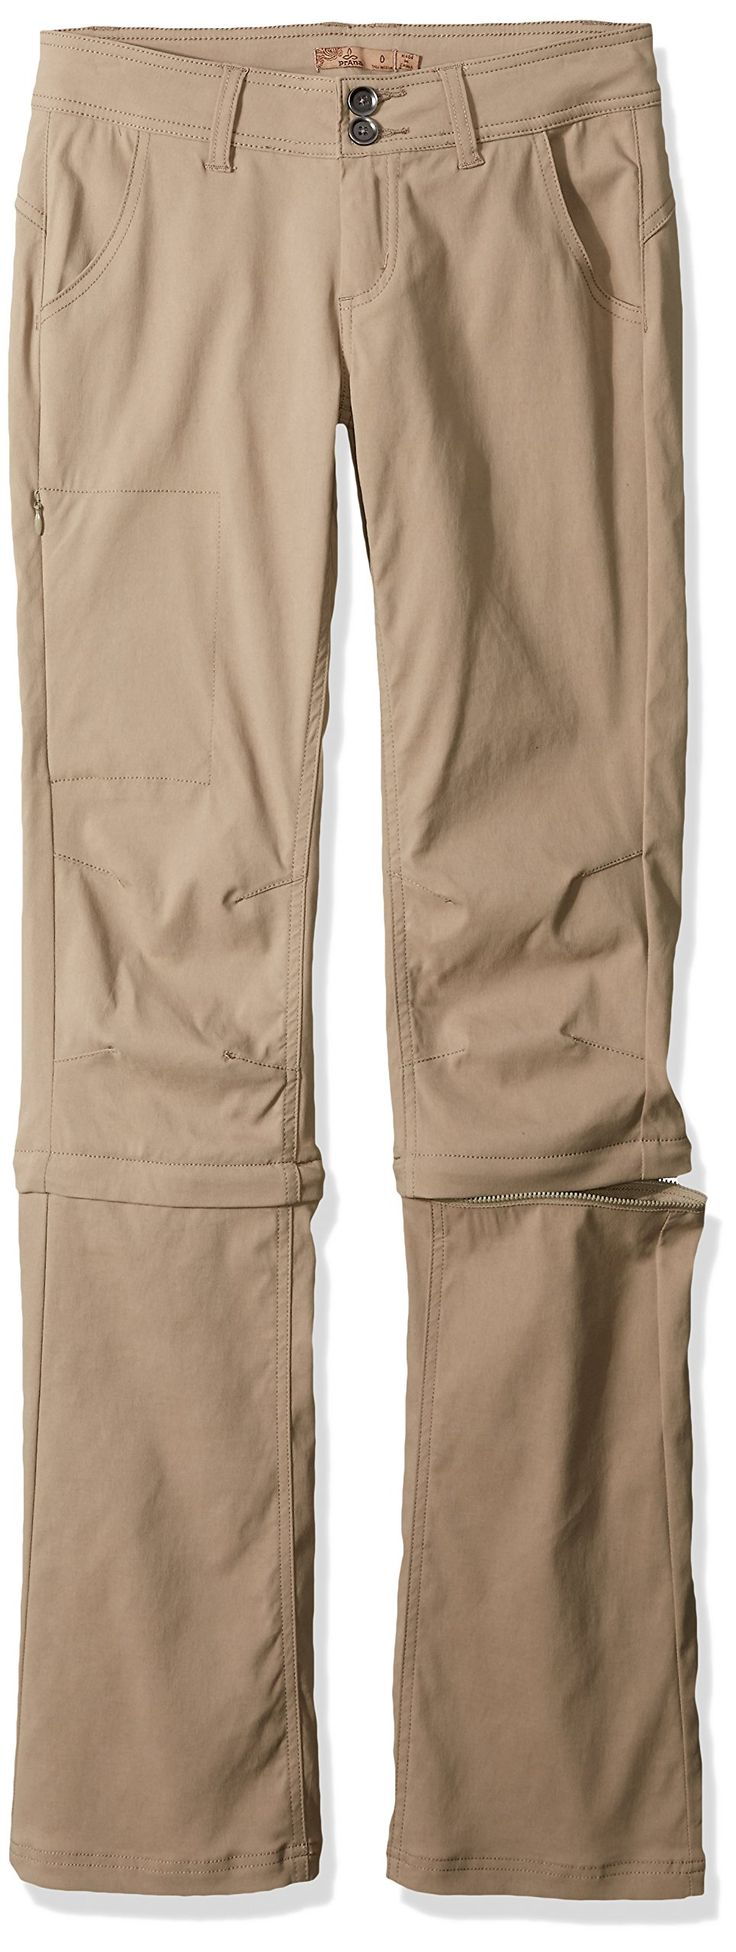 prAna Women's Halle Convertible - Tall Pants, Dark Khaki, Size 4